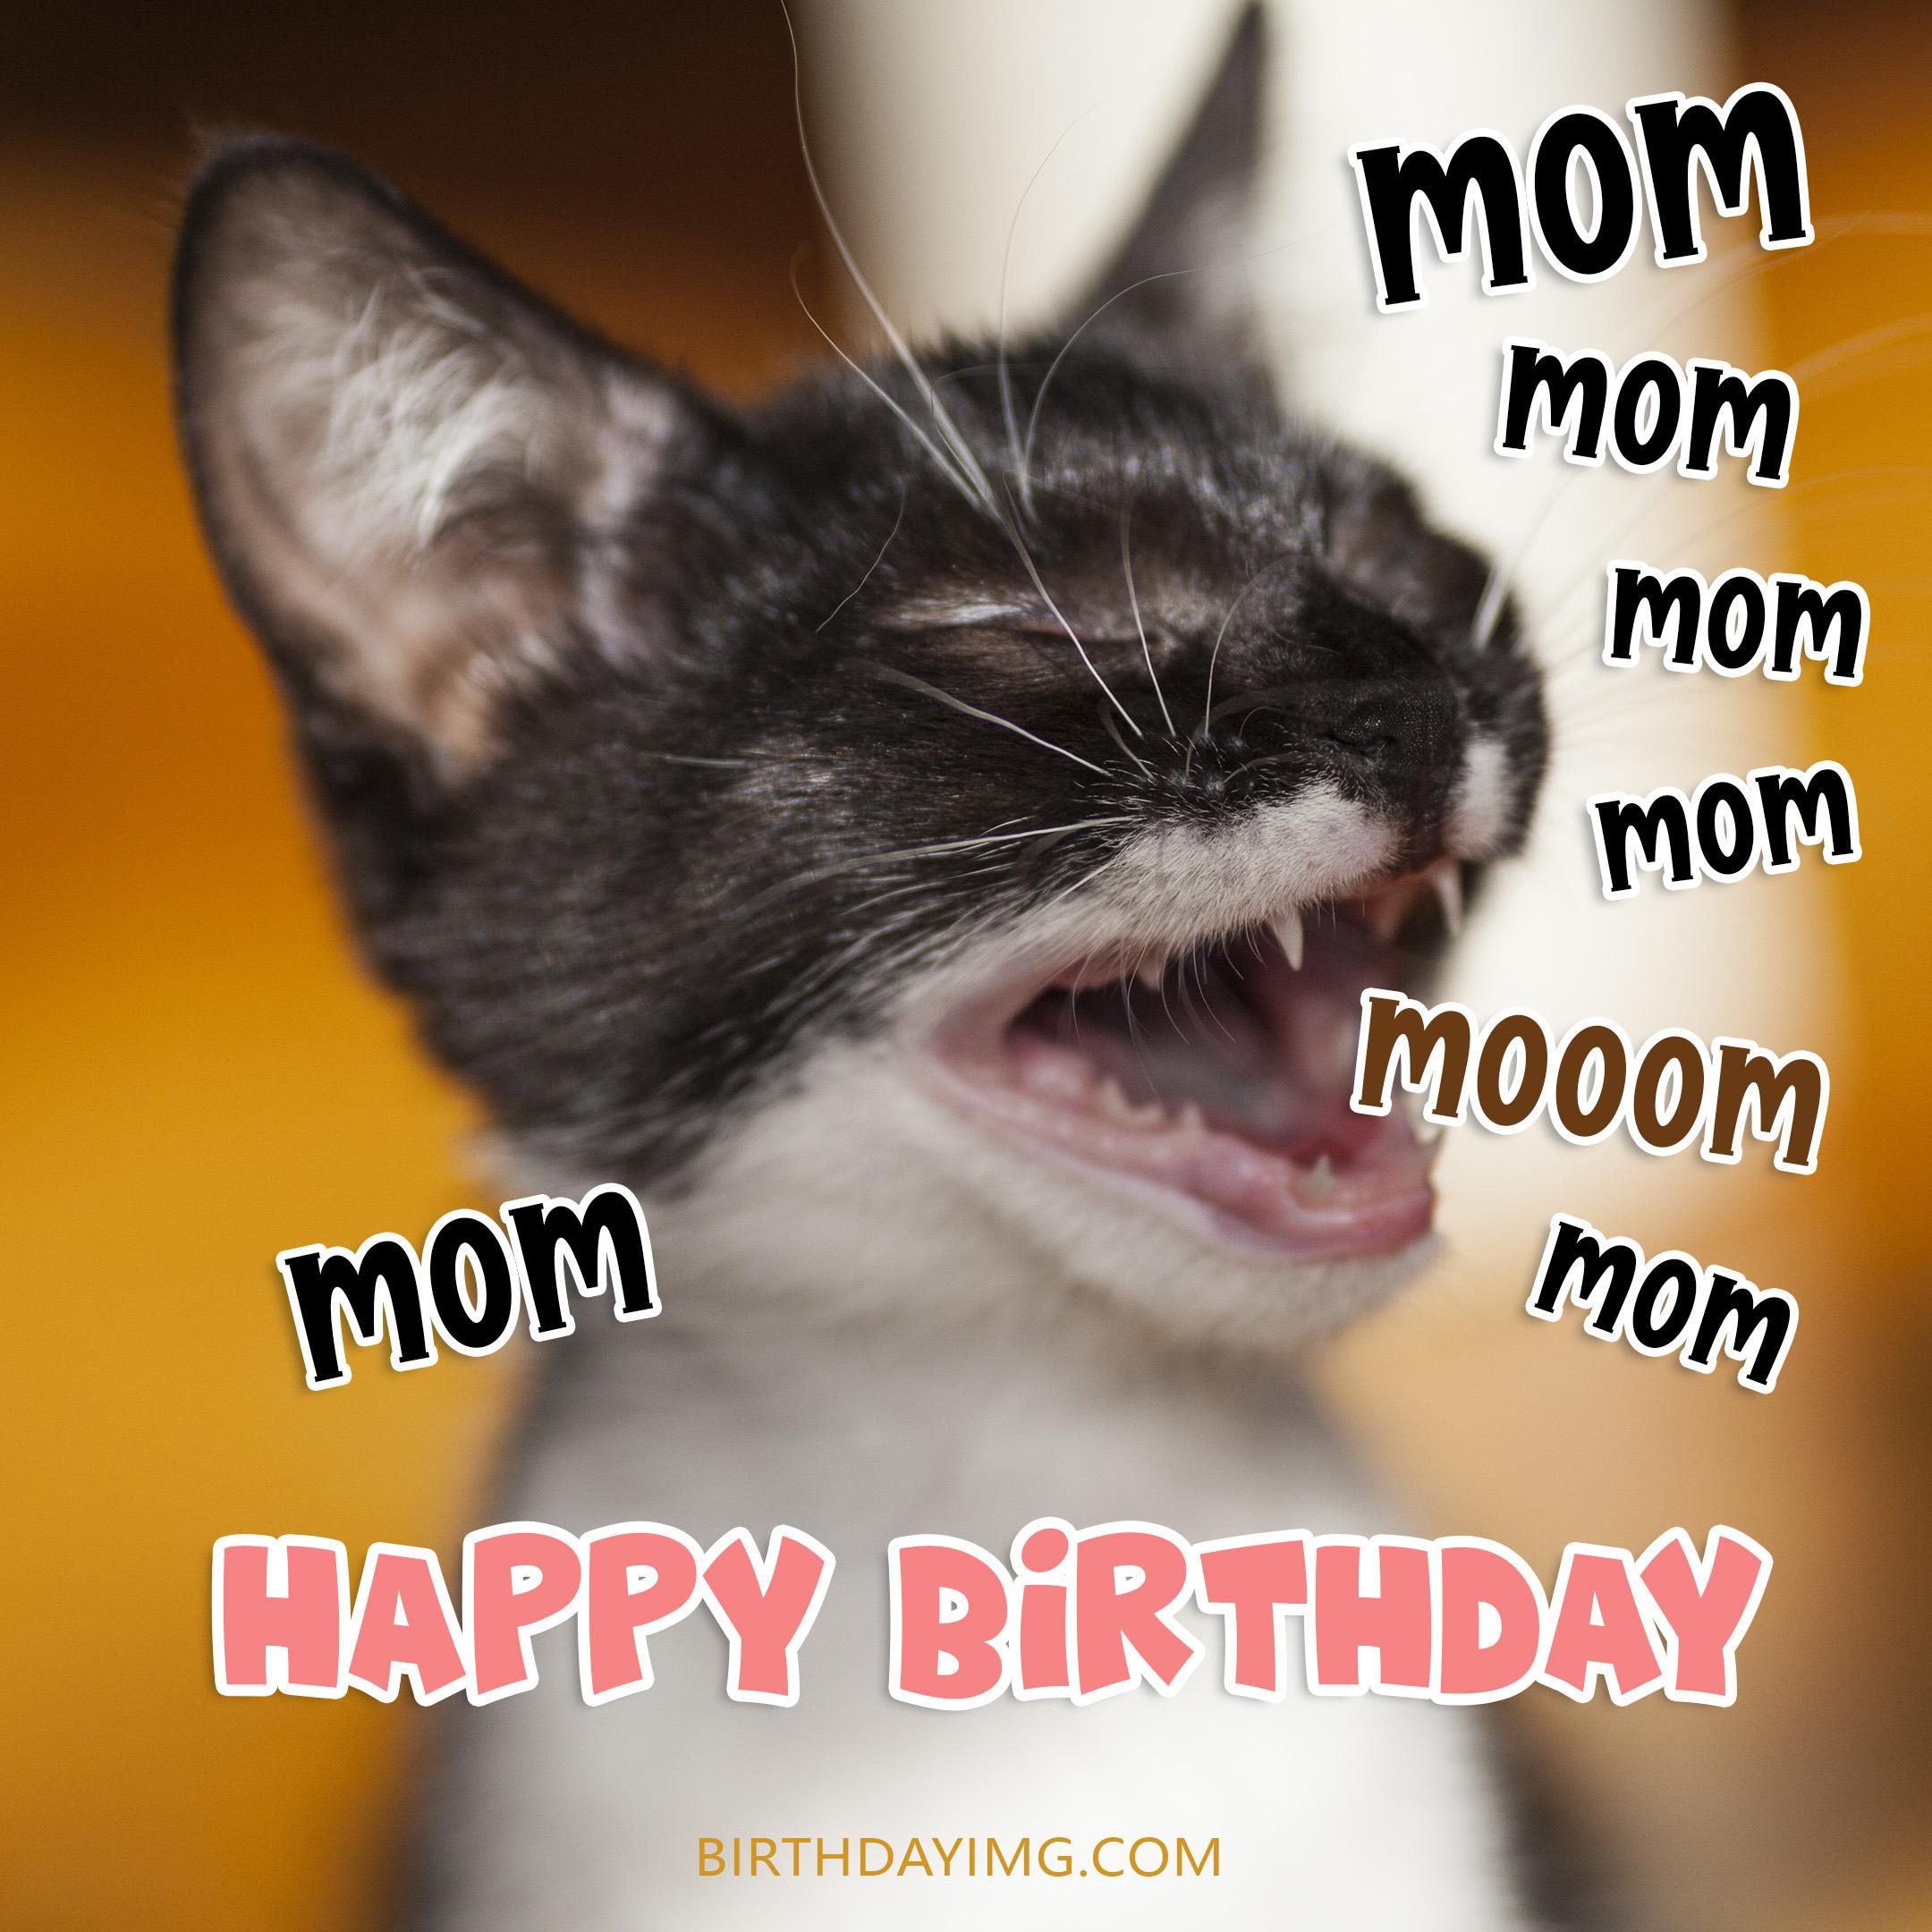 Free Funny Happy Birthday Image For Mom With Cat - birthdayimg.com